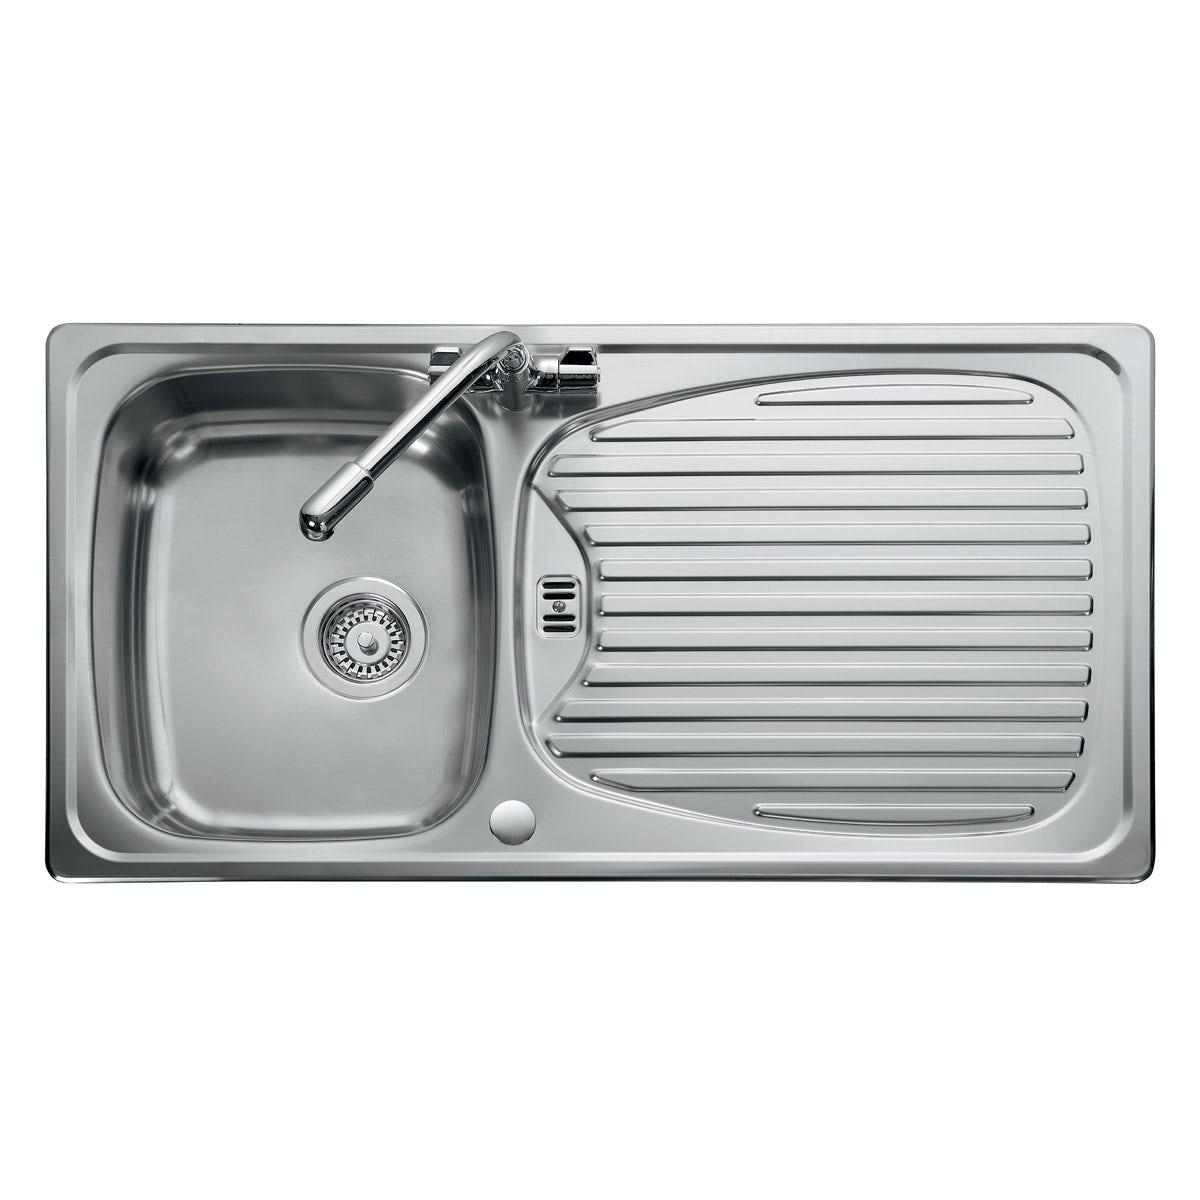 Leisure Euroline 1.0 bowl reversible kitchen sink